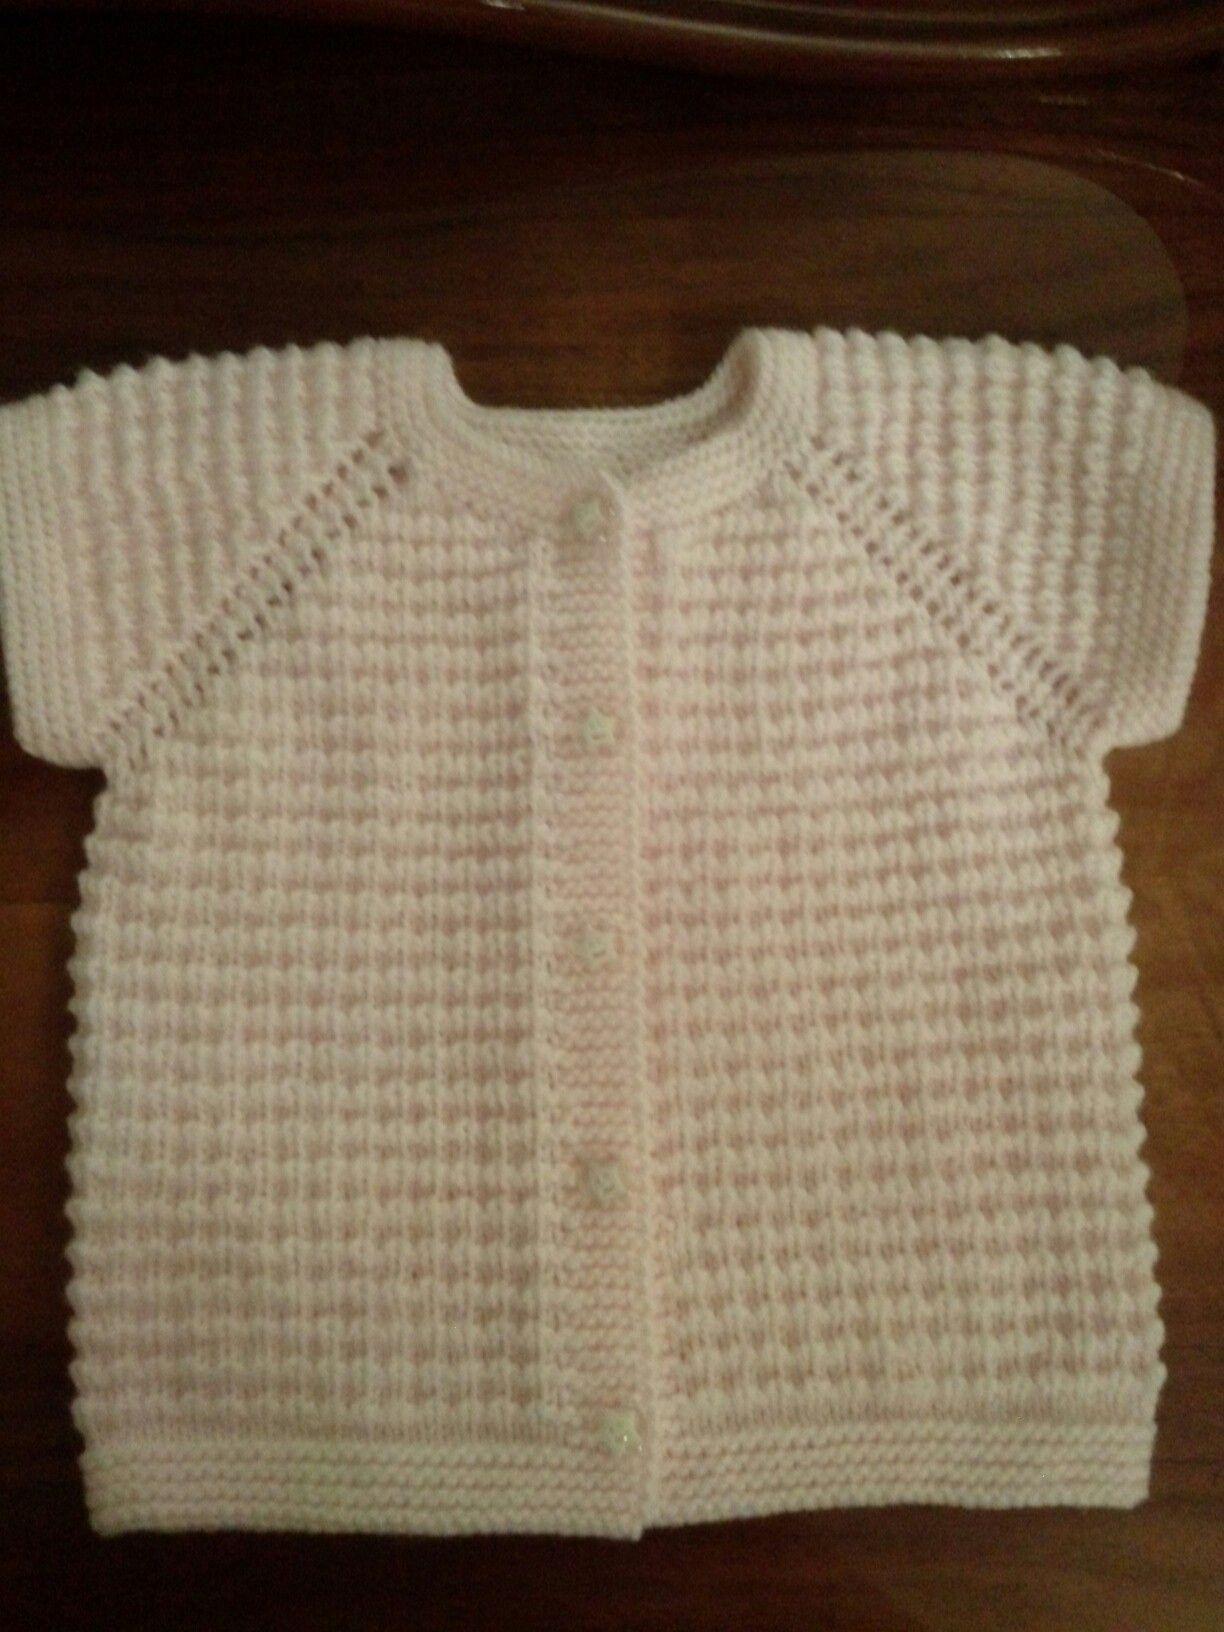 Pin by selma selma on Bebek | Pinterest | Baby knitting, Baby vest ...